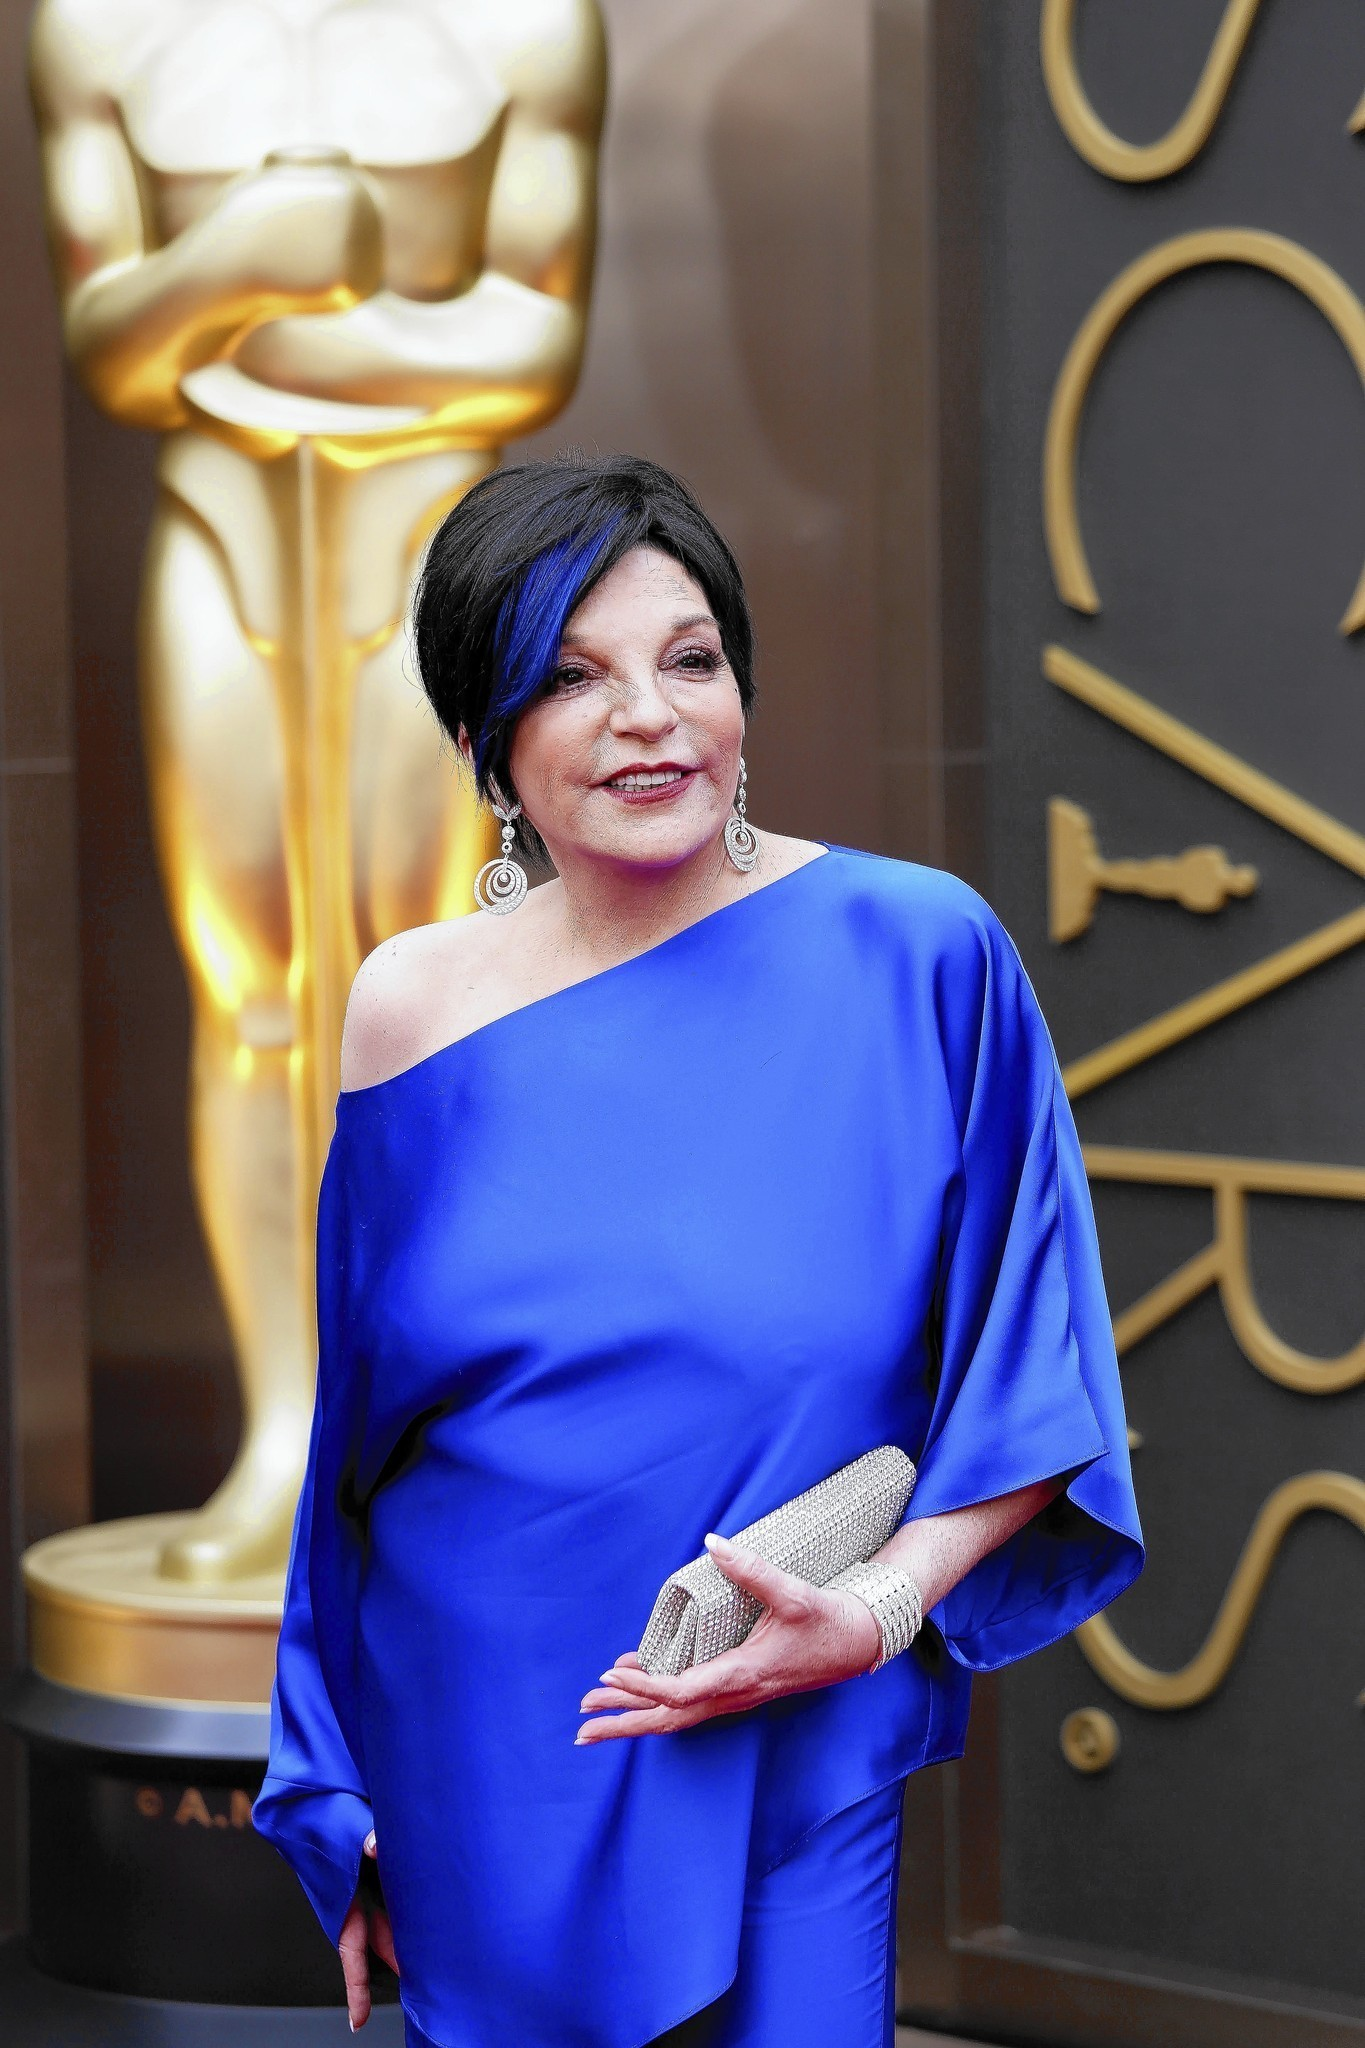 Liza minnelli 39 s wonderful life chicago tribune for House of liza